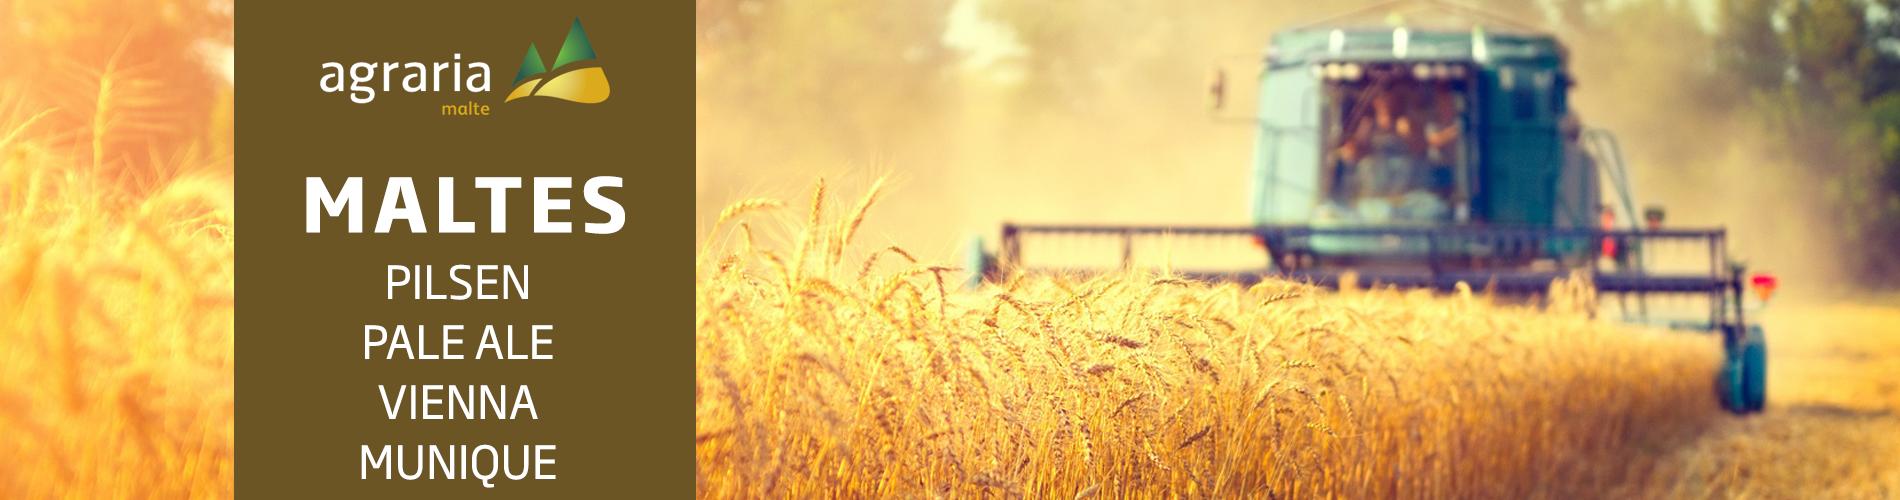 Maltes Agraria